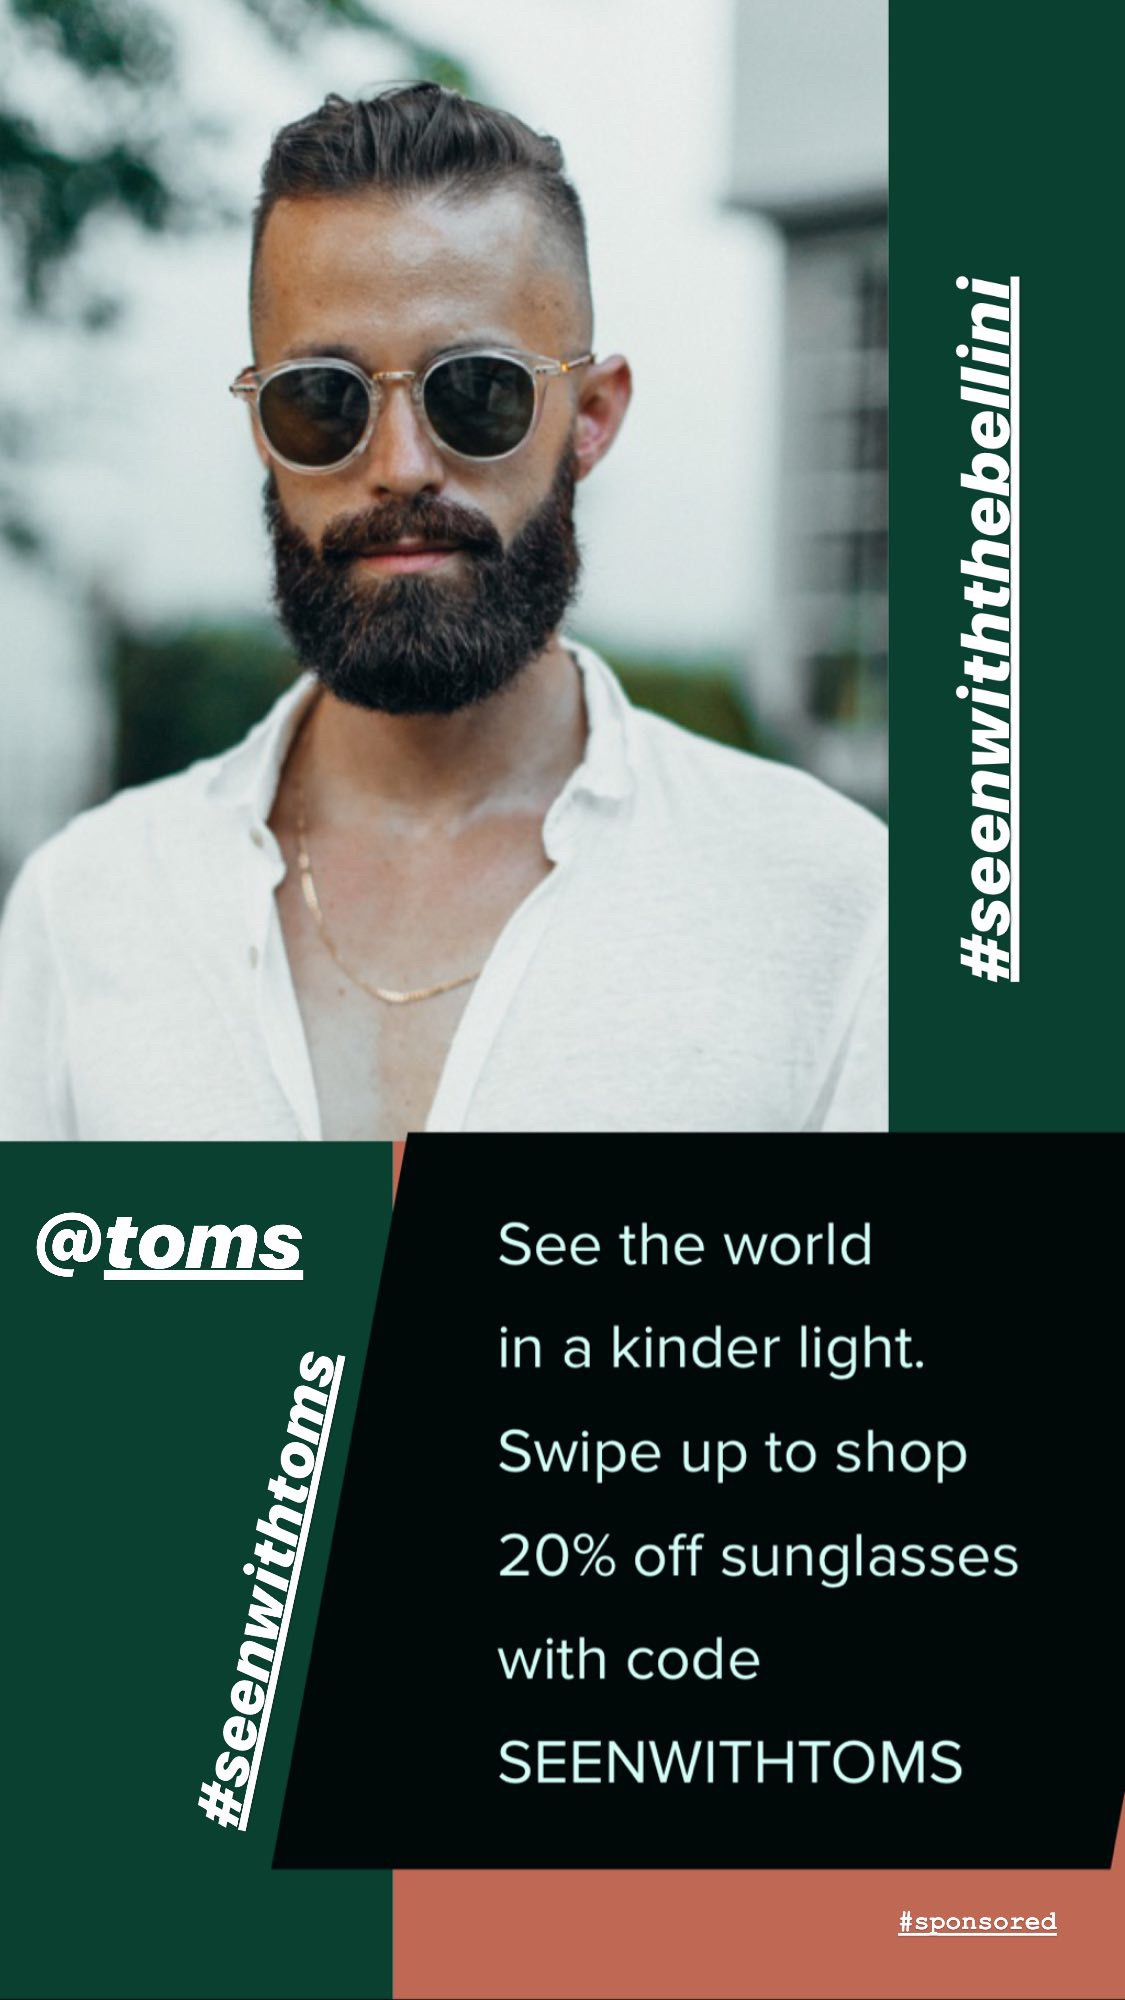 toms sunglasses instagram story 3